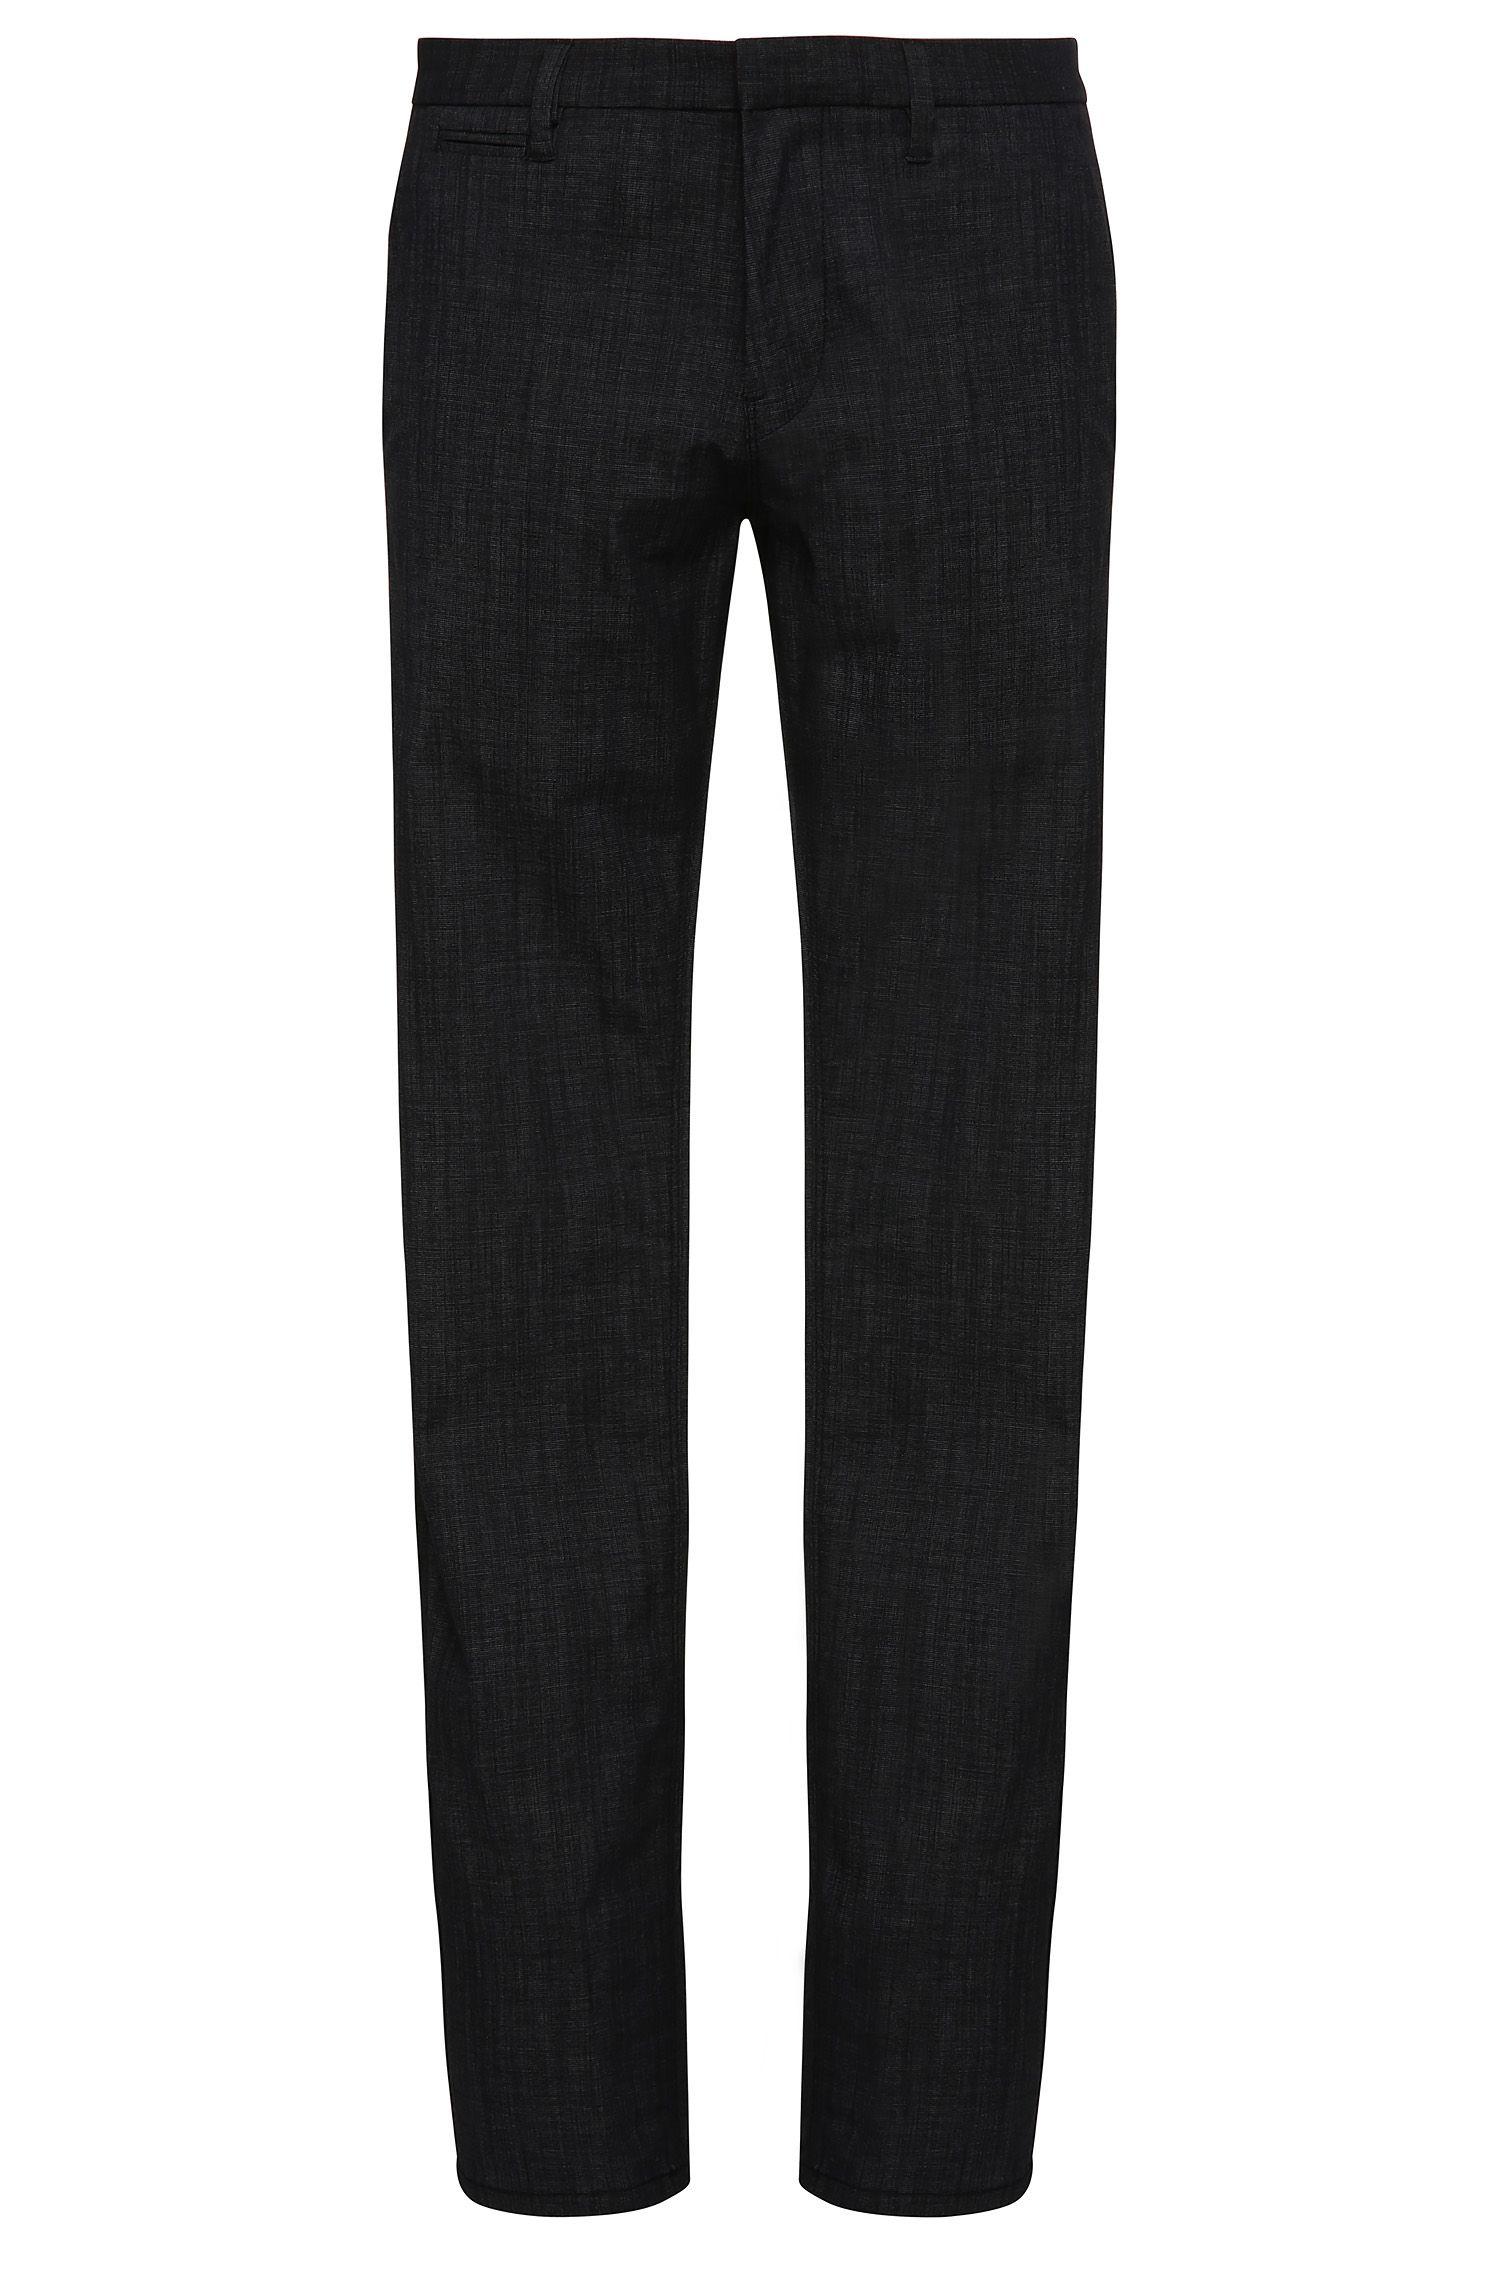 Stretch Cotton Blend Pant, Slim Fit | Schino Slim W